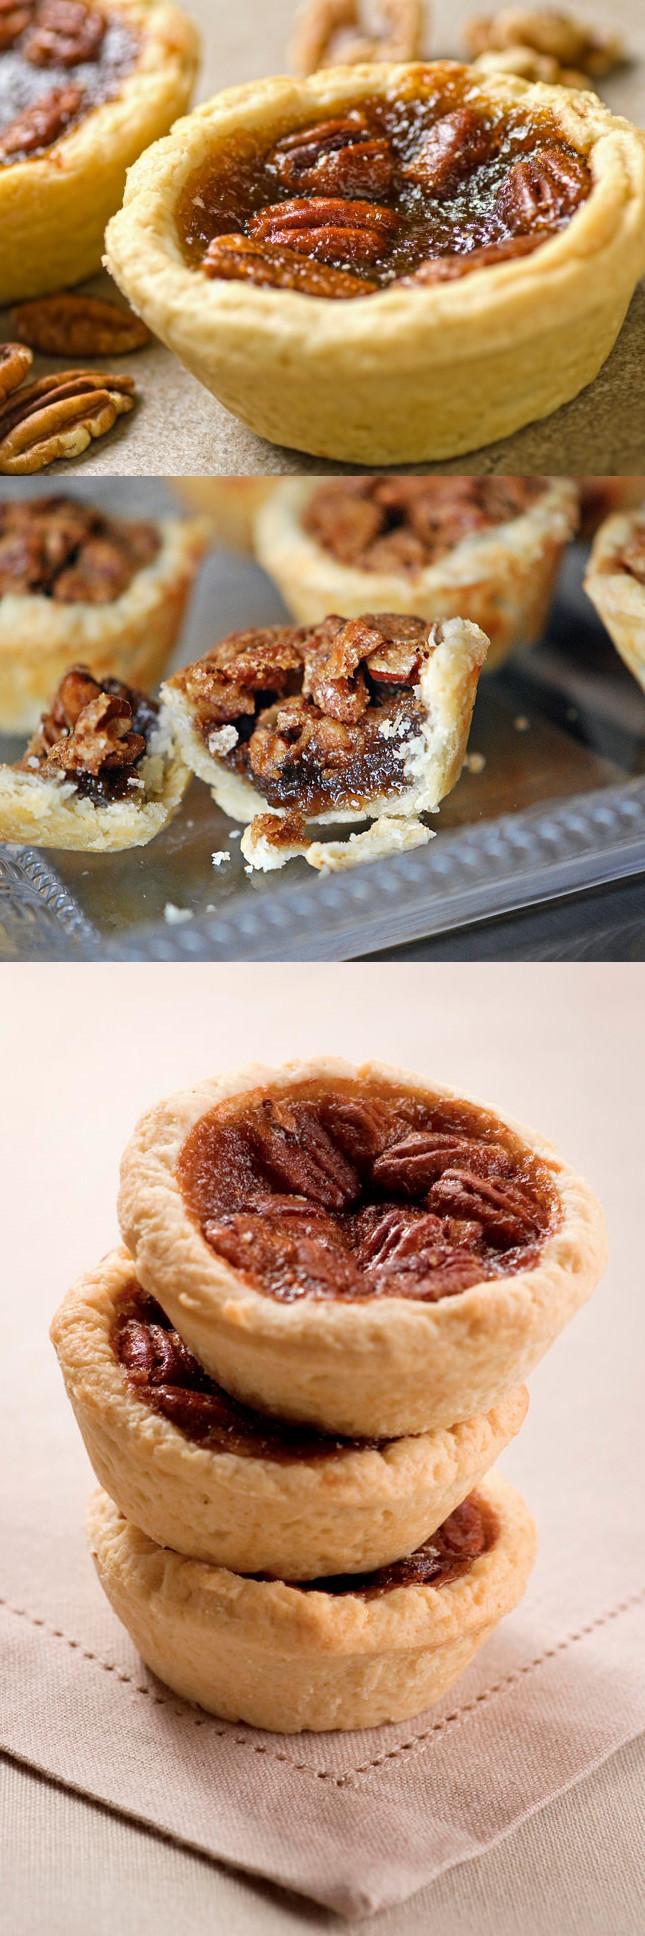 Easy Thanksgiving Pie Recipes  Granny's Mini Pecan Pie Tarts